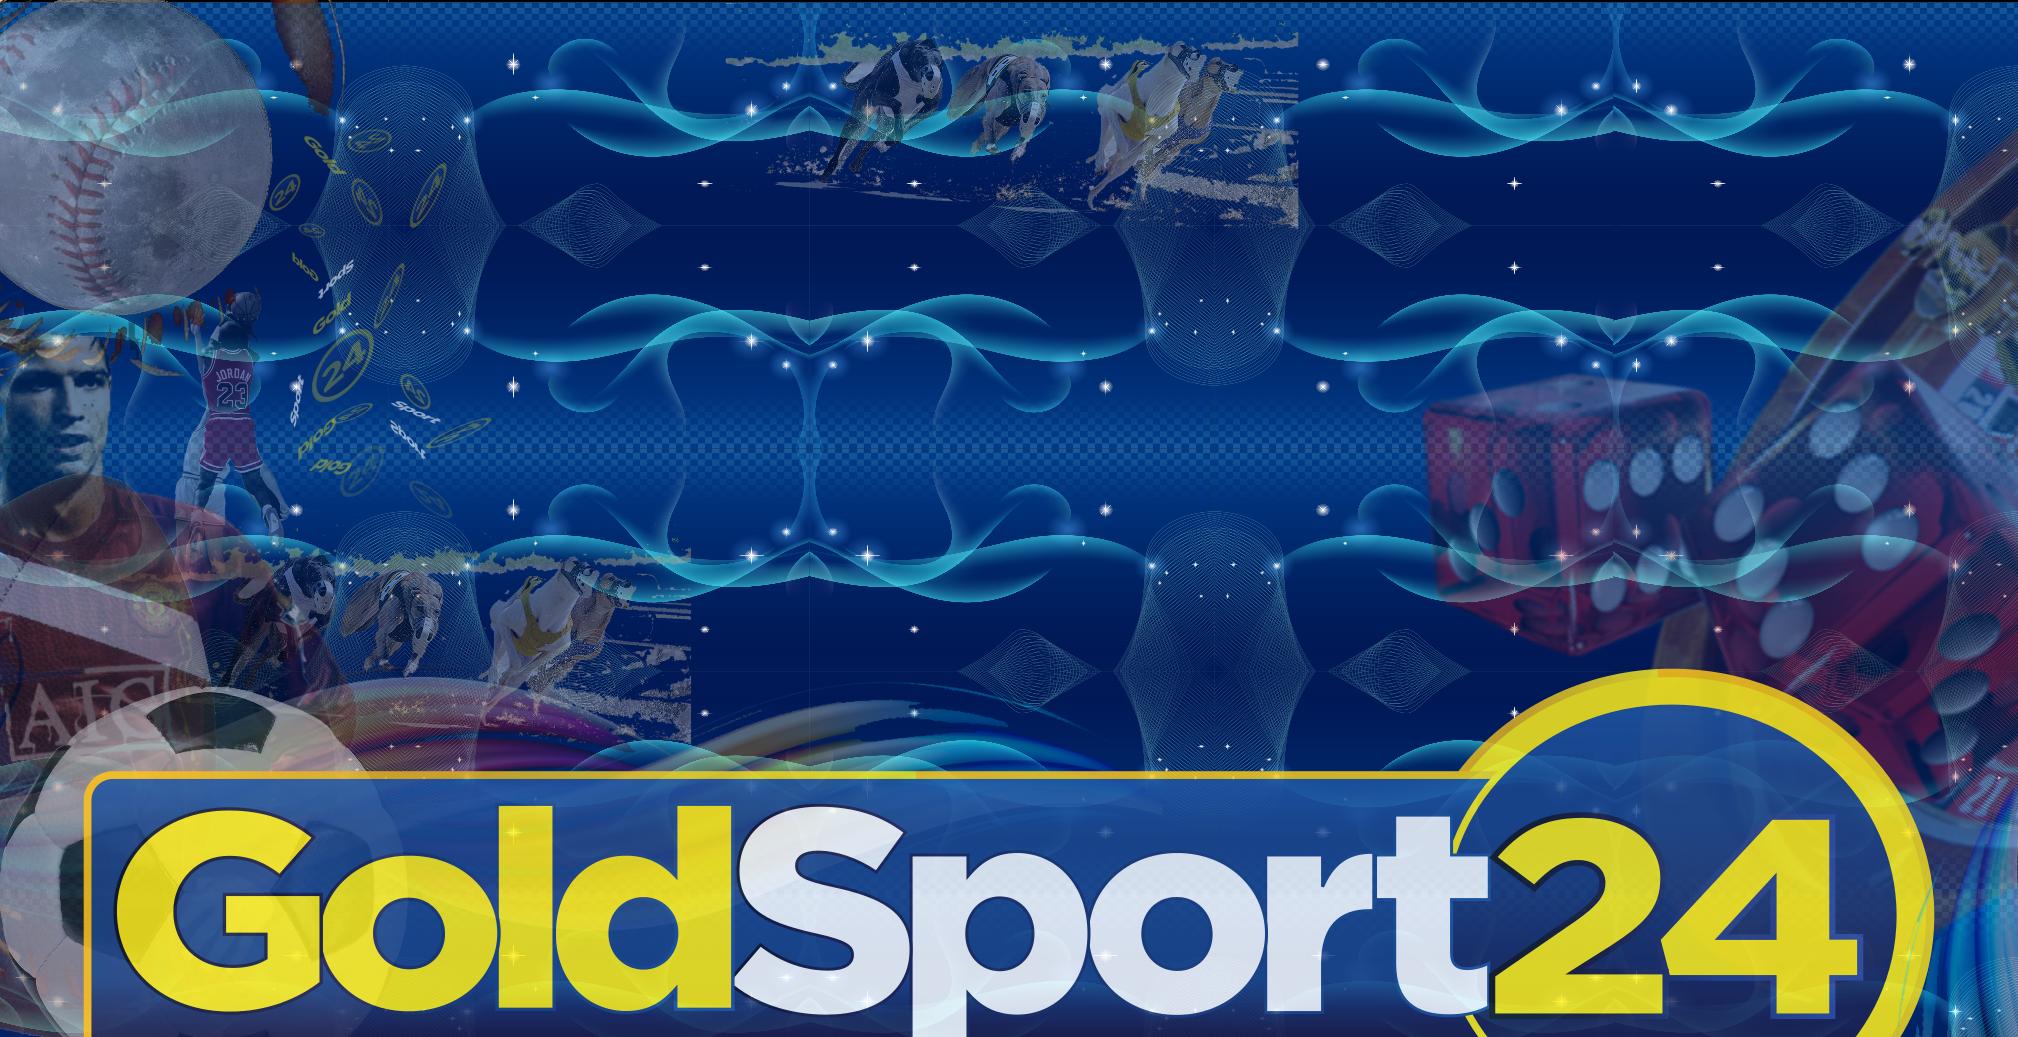 bonus goldsport24